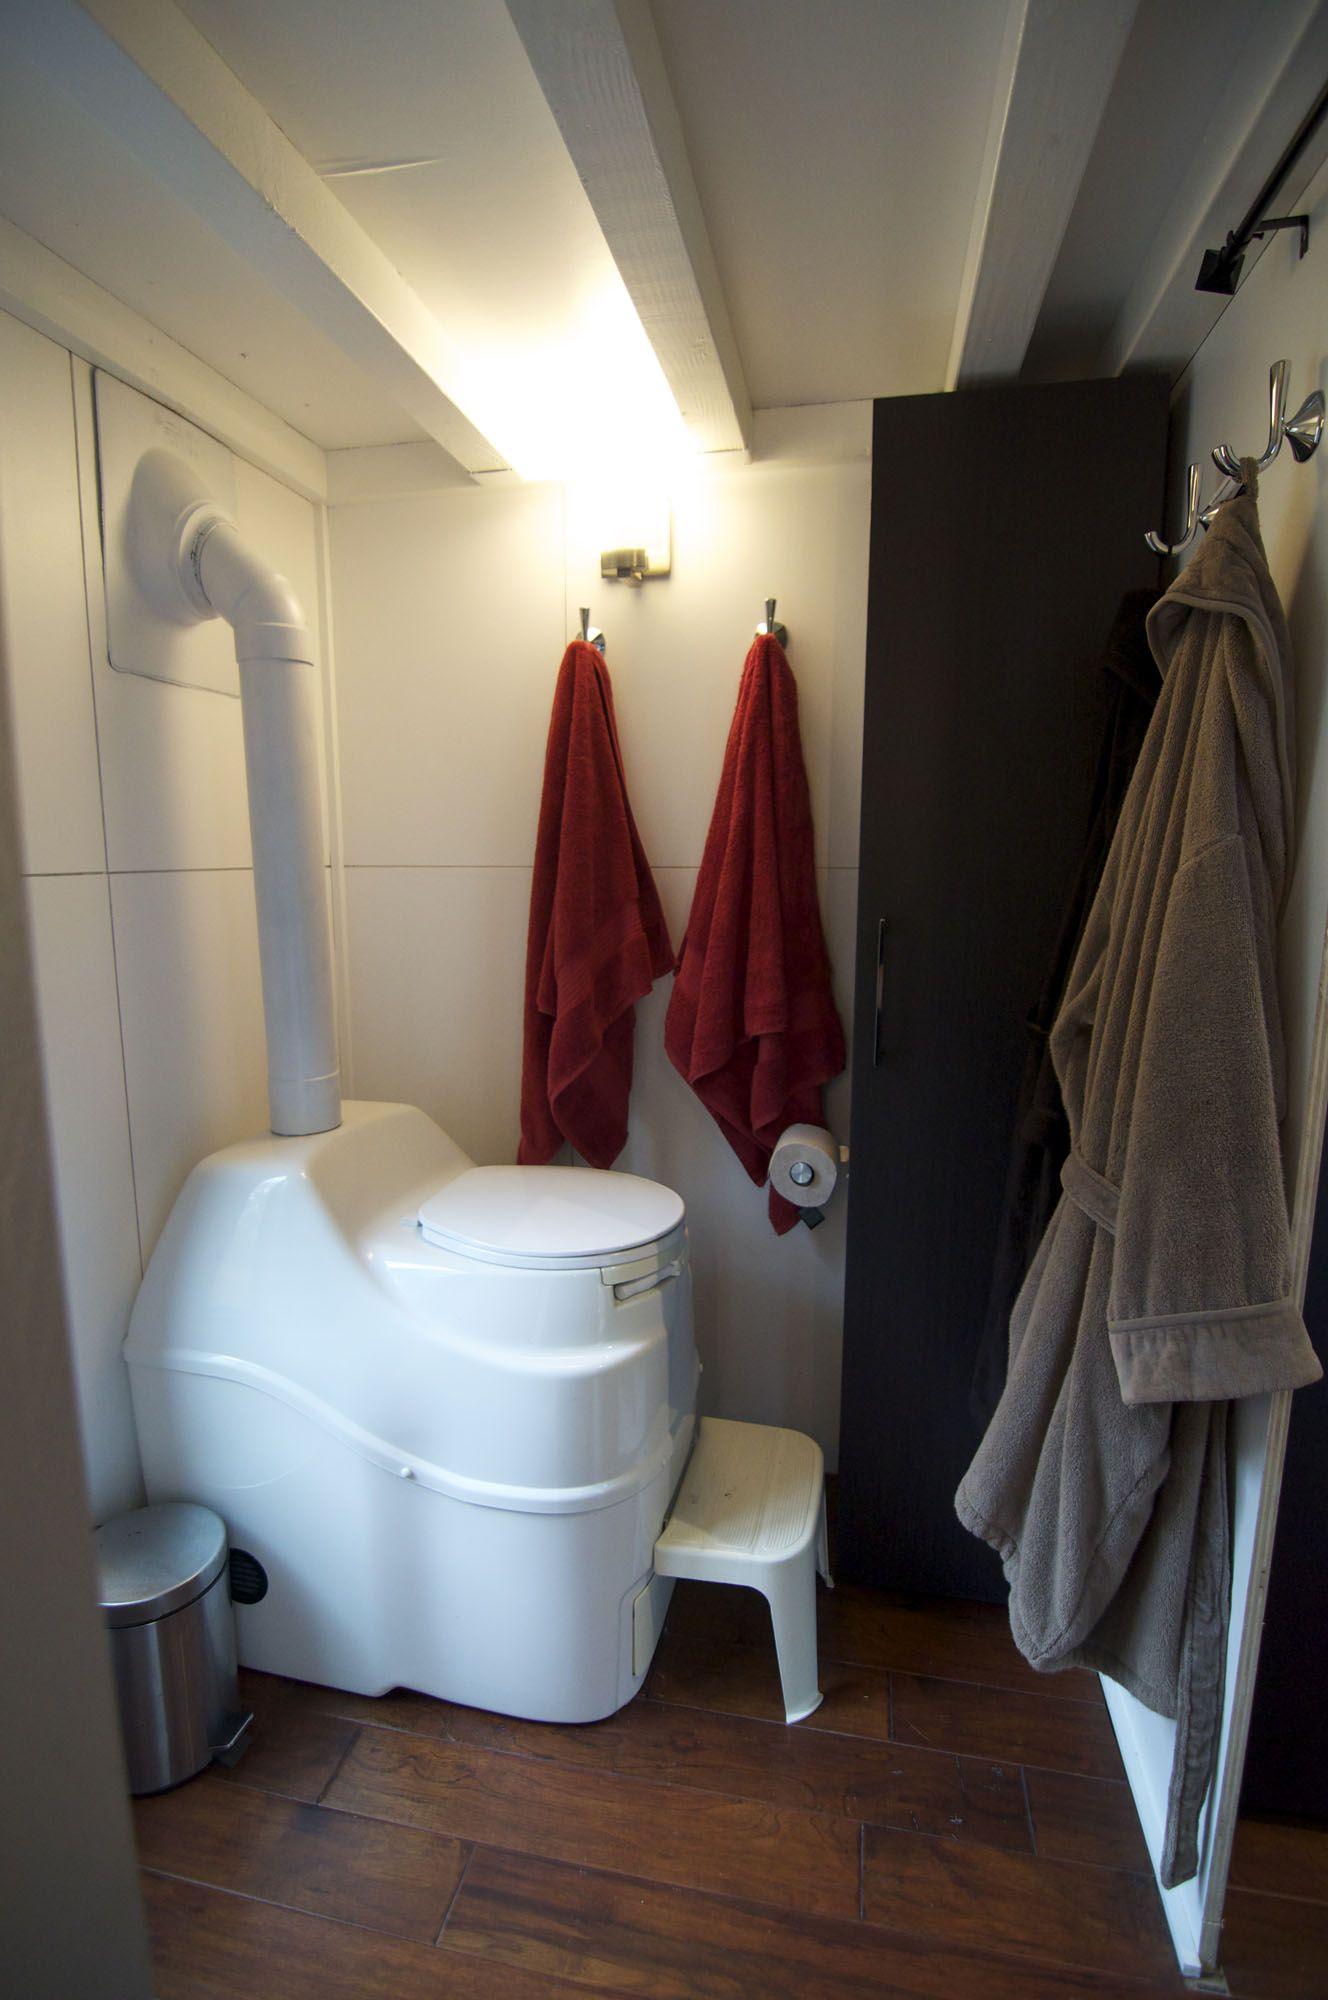 Bathroom Toilet Tiny House On Wheels Modern Tiny House Tiny House Bathtub Tiny House Inspiration